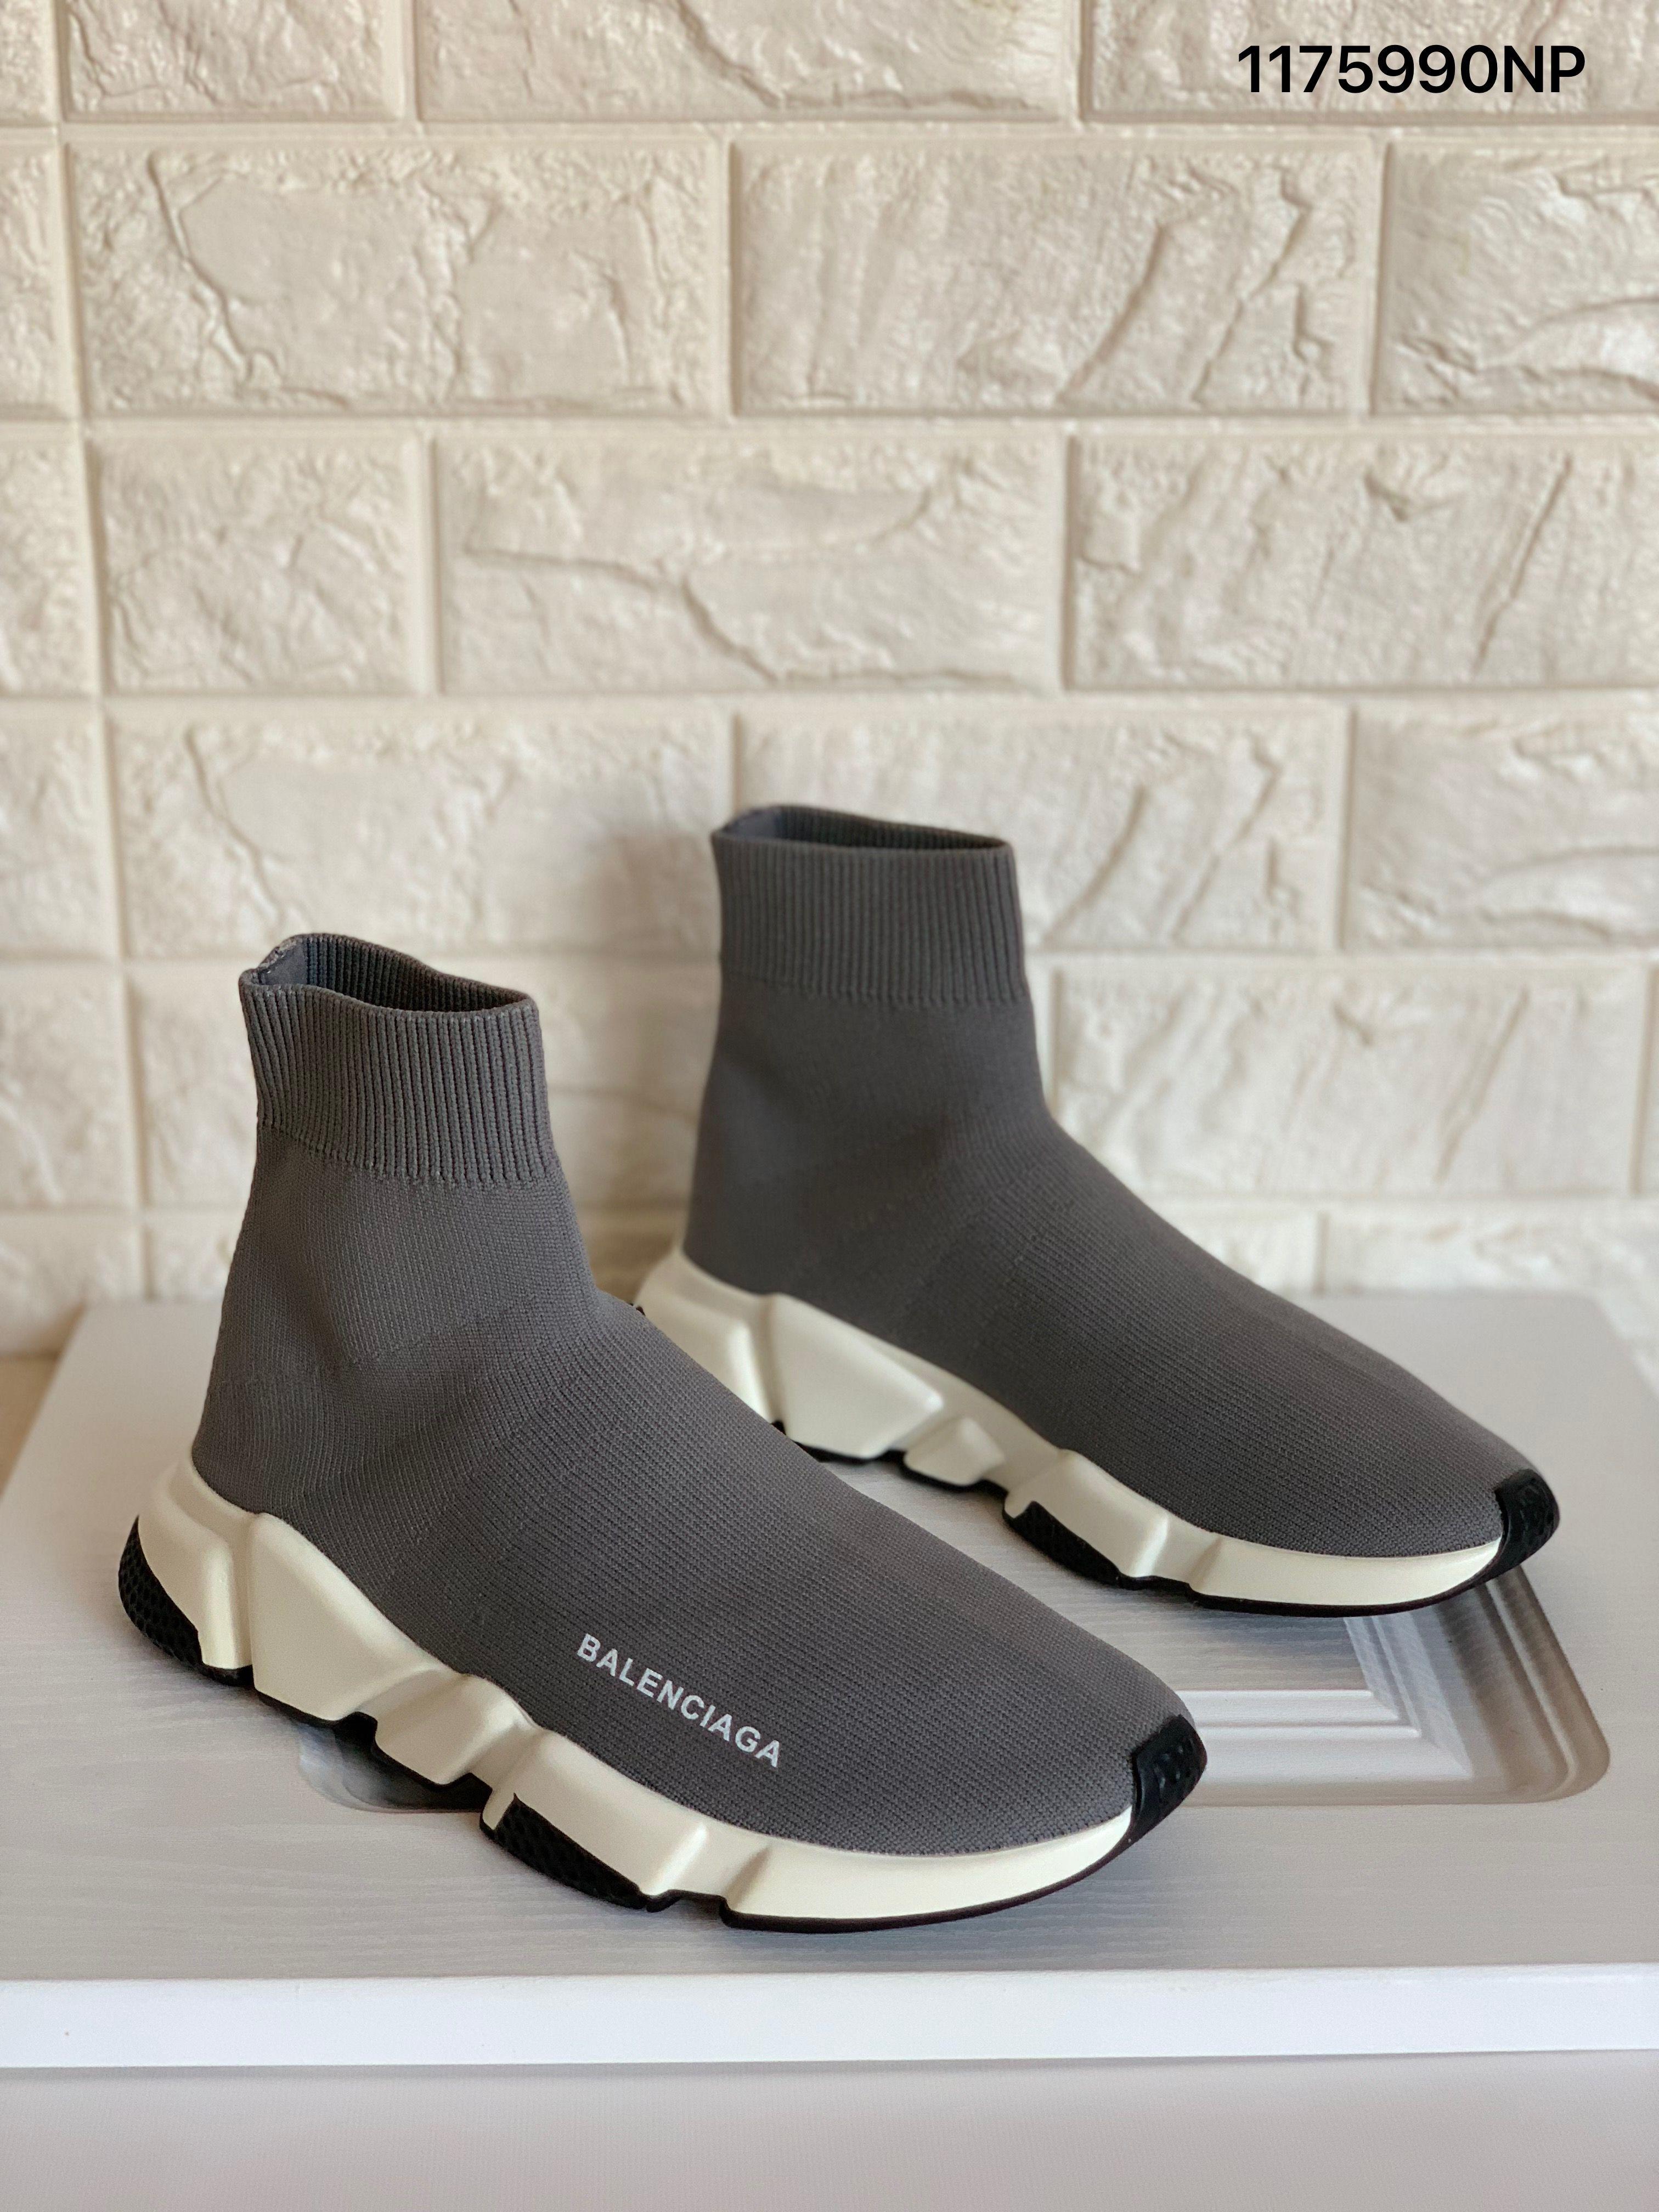 Balenciaga gray sock boots sneakers